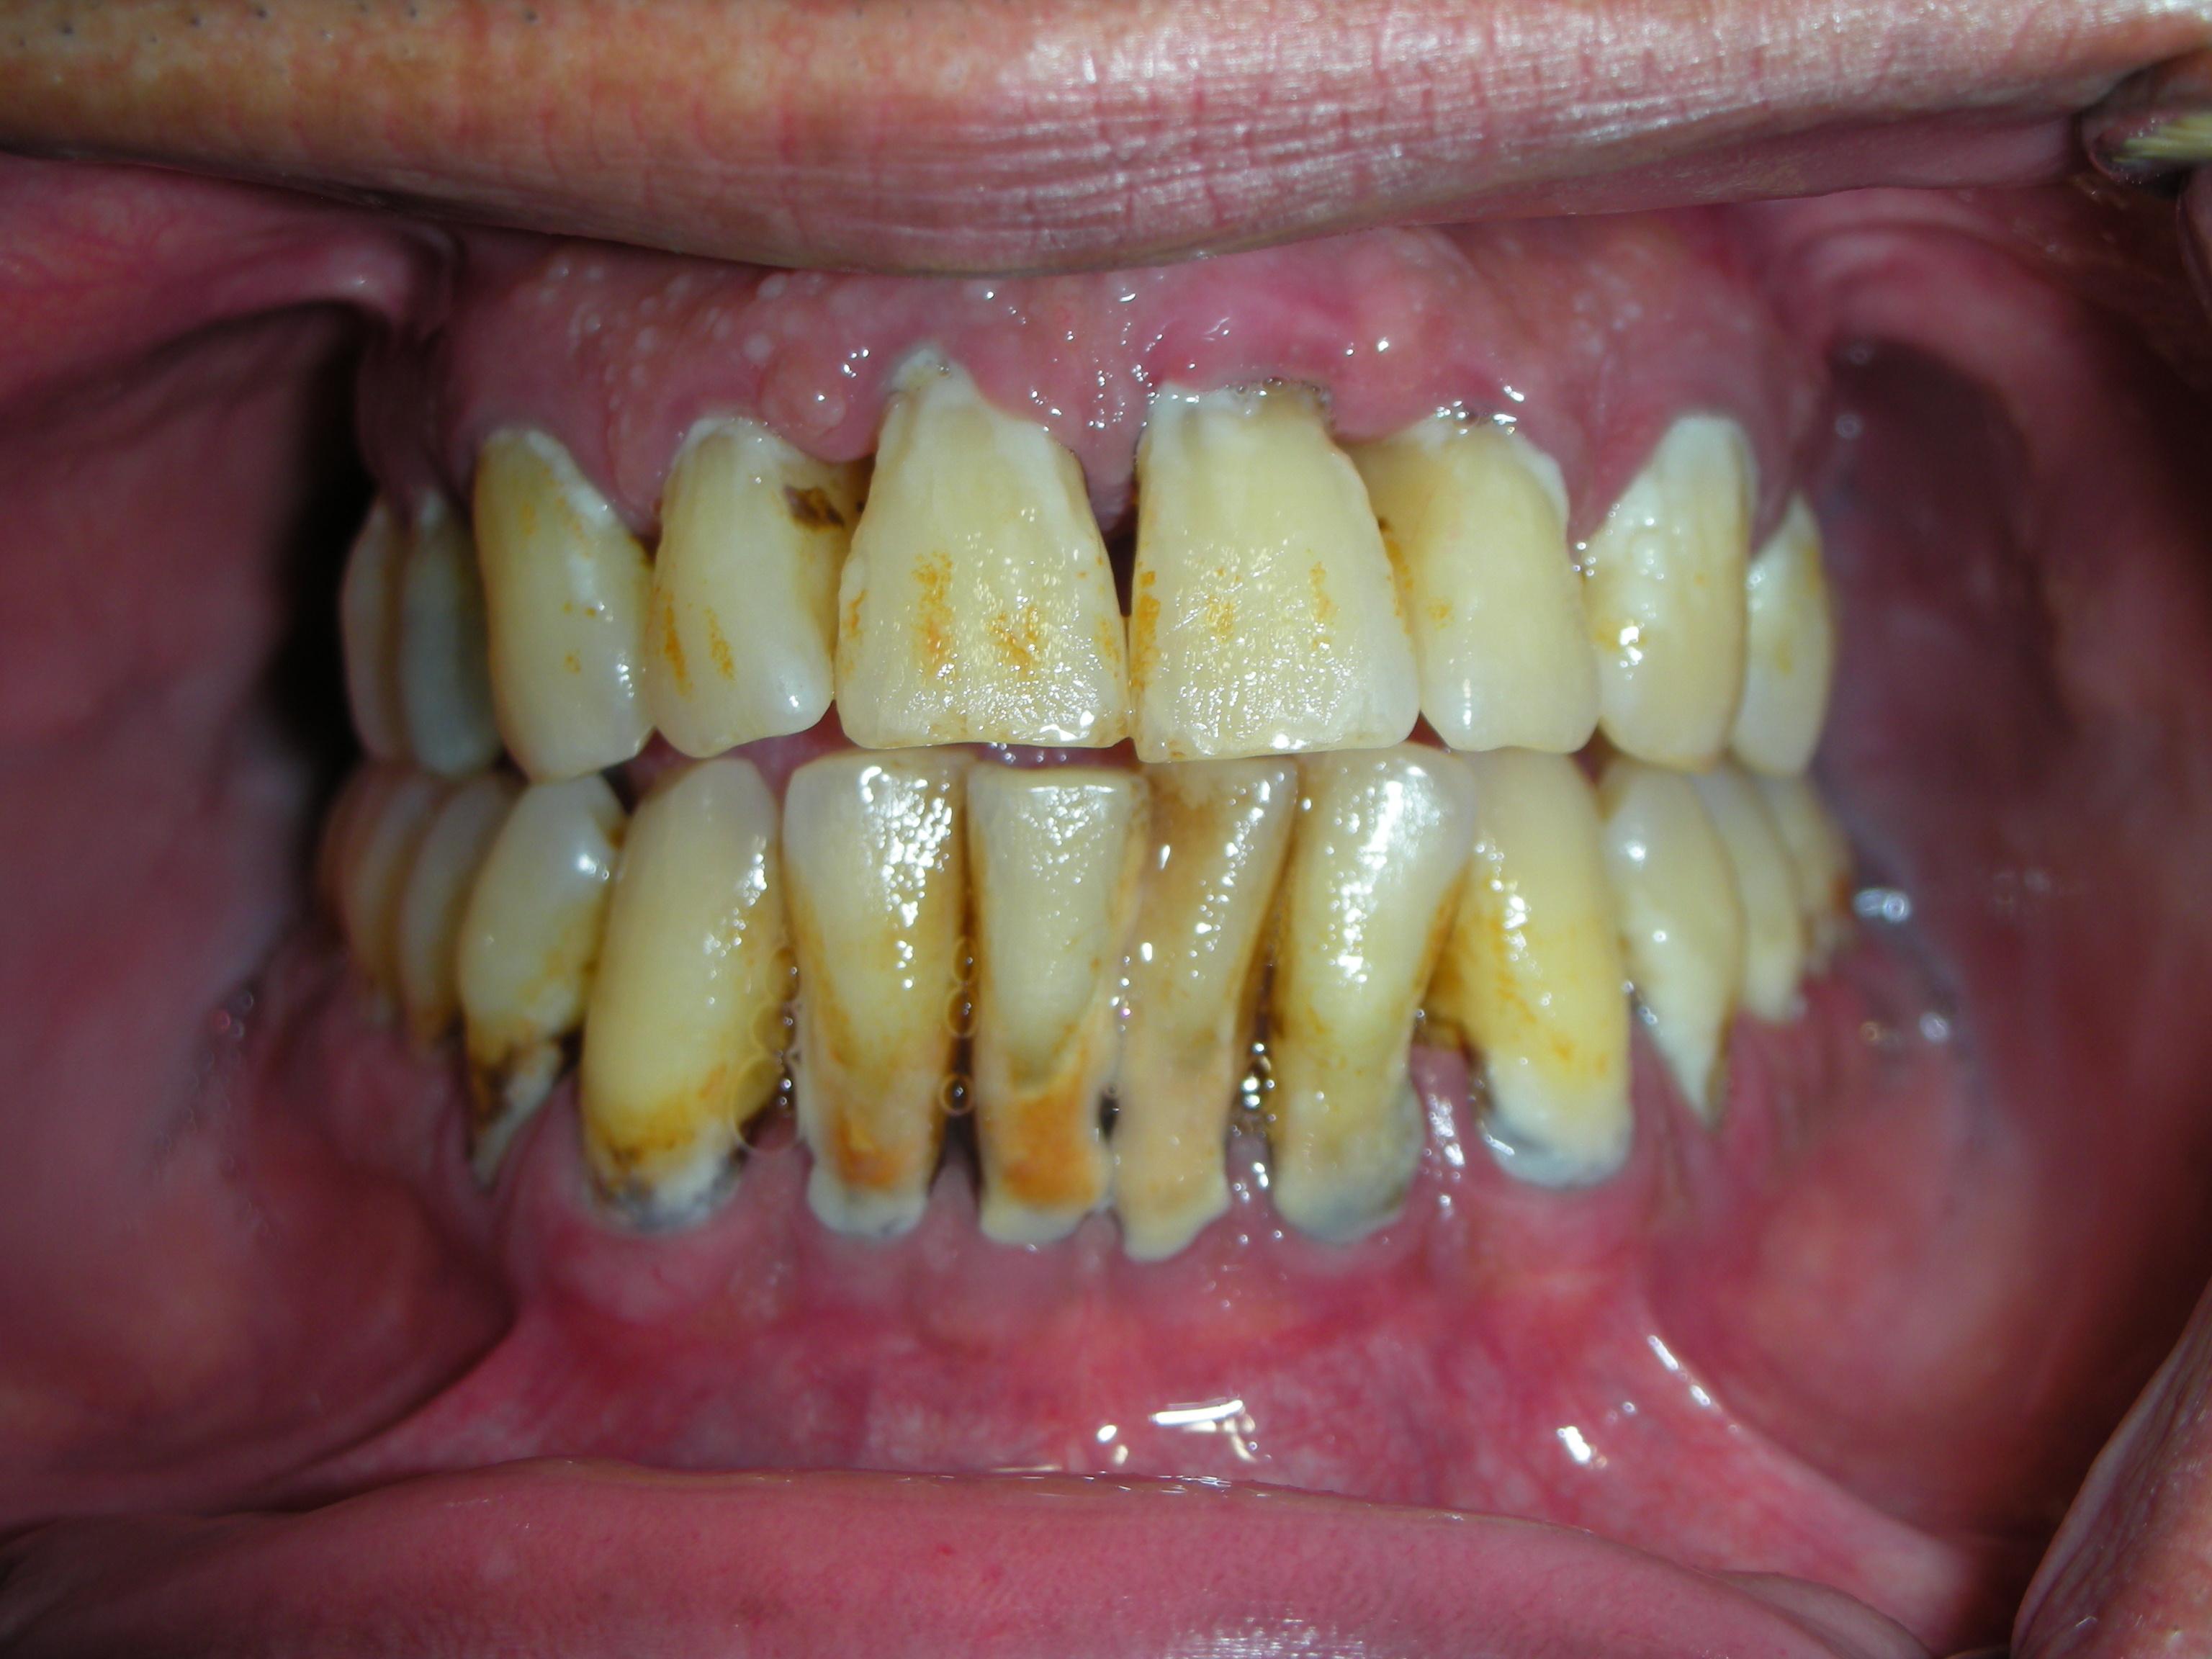 Advanced Periodontitis